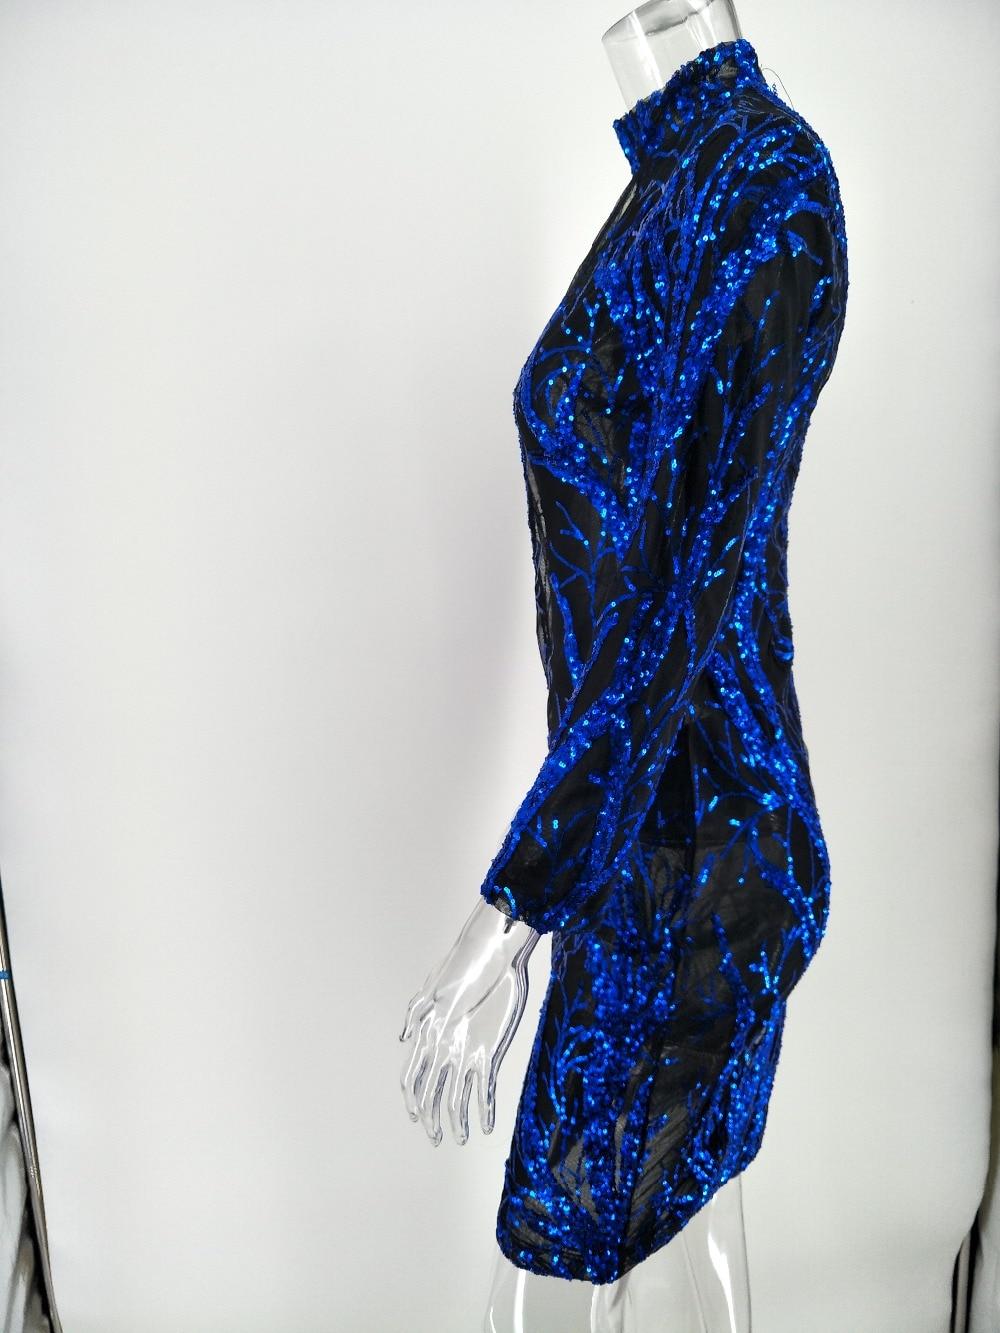 Top Fashion Ladies Sequin Dress Celebrity Runway Bodycon Women Dress Long  Sleeve Midi Dress X003-in Dresses from Women s Clothing on Aliexpress.com  ... 7a323e312cc2